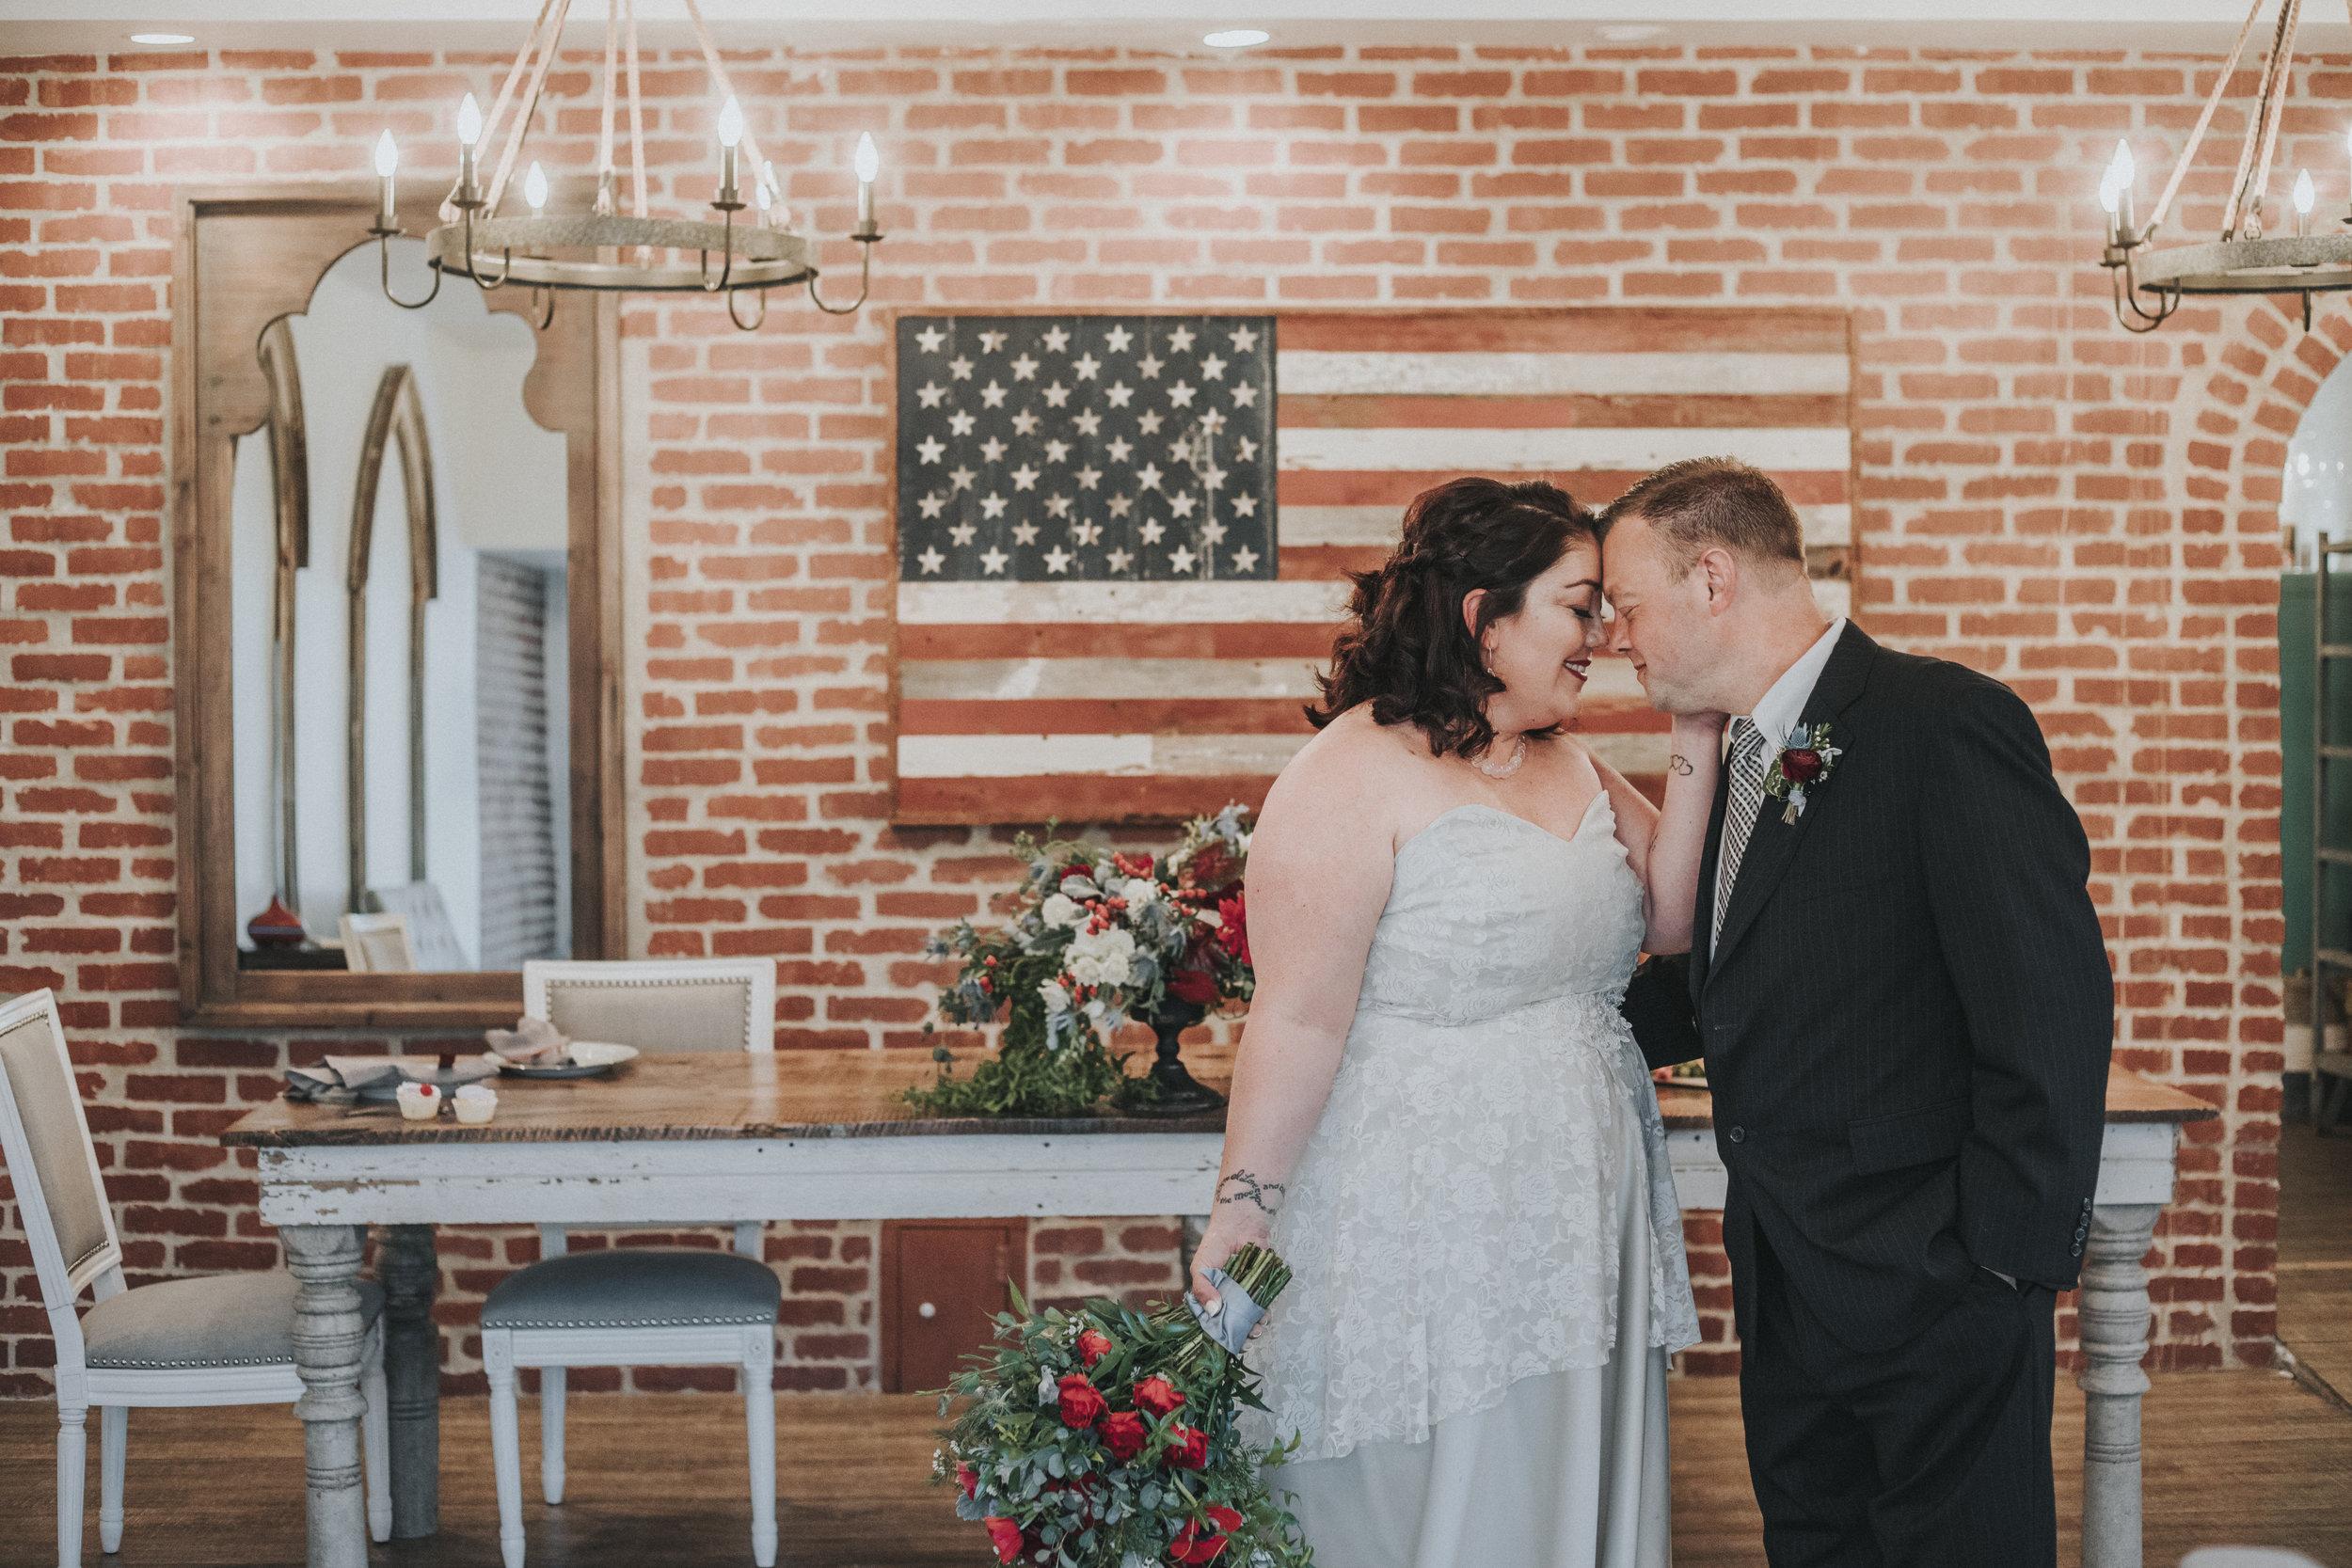 95 midwest-colorado-nebraska-elopement-photography-gretna-turtledoves.jpg